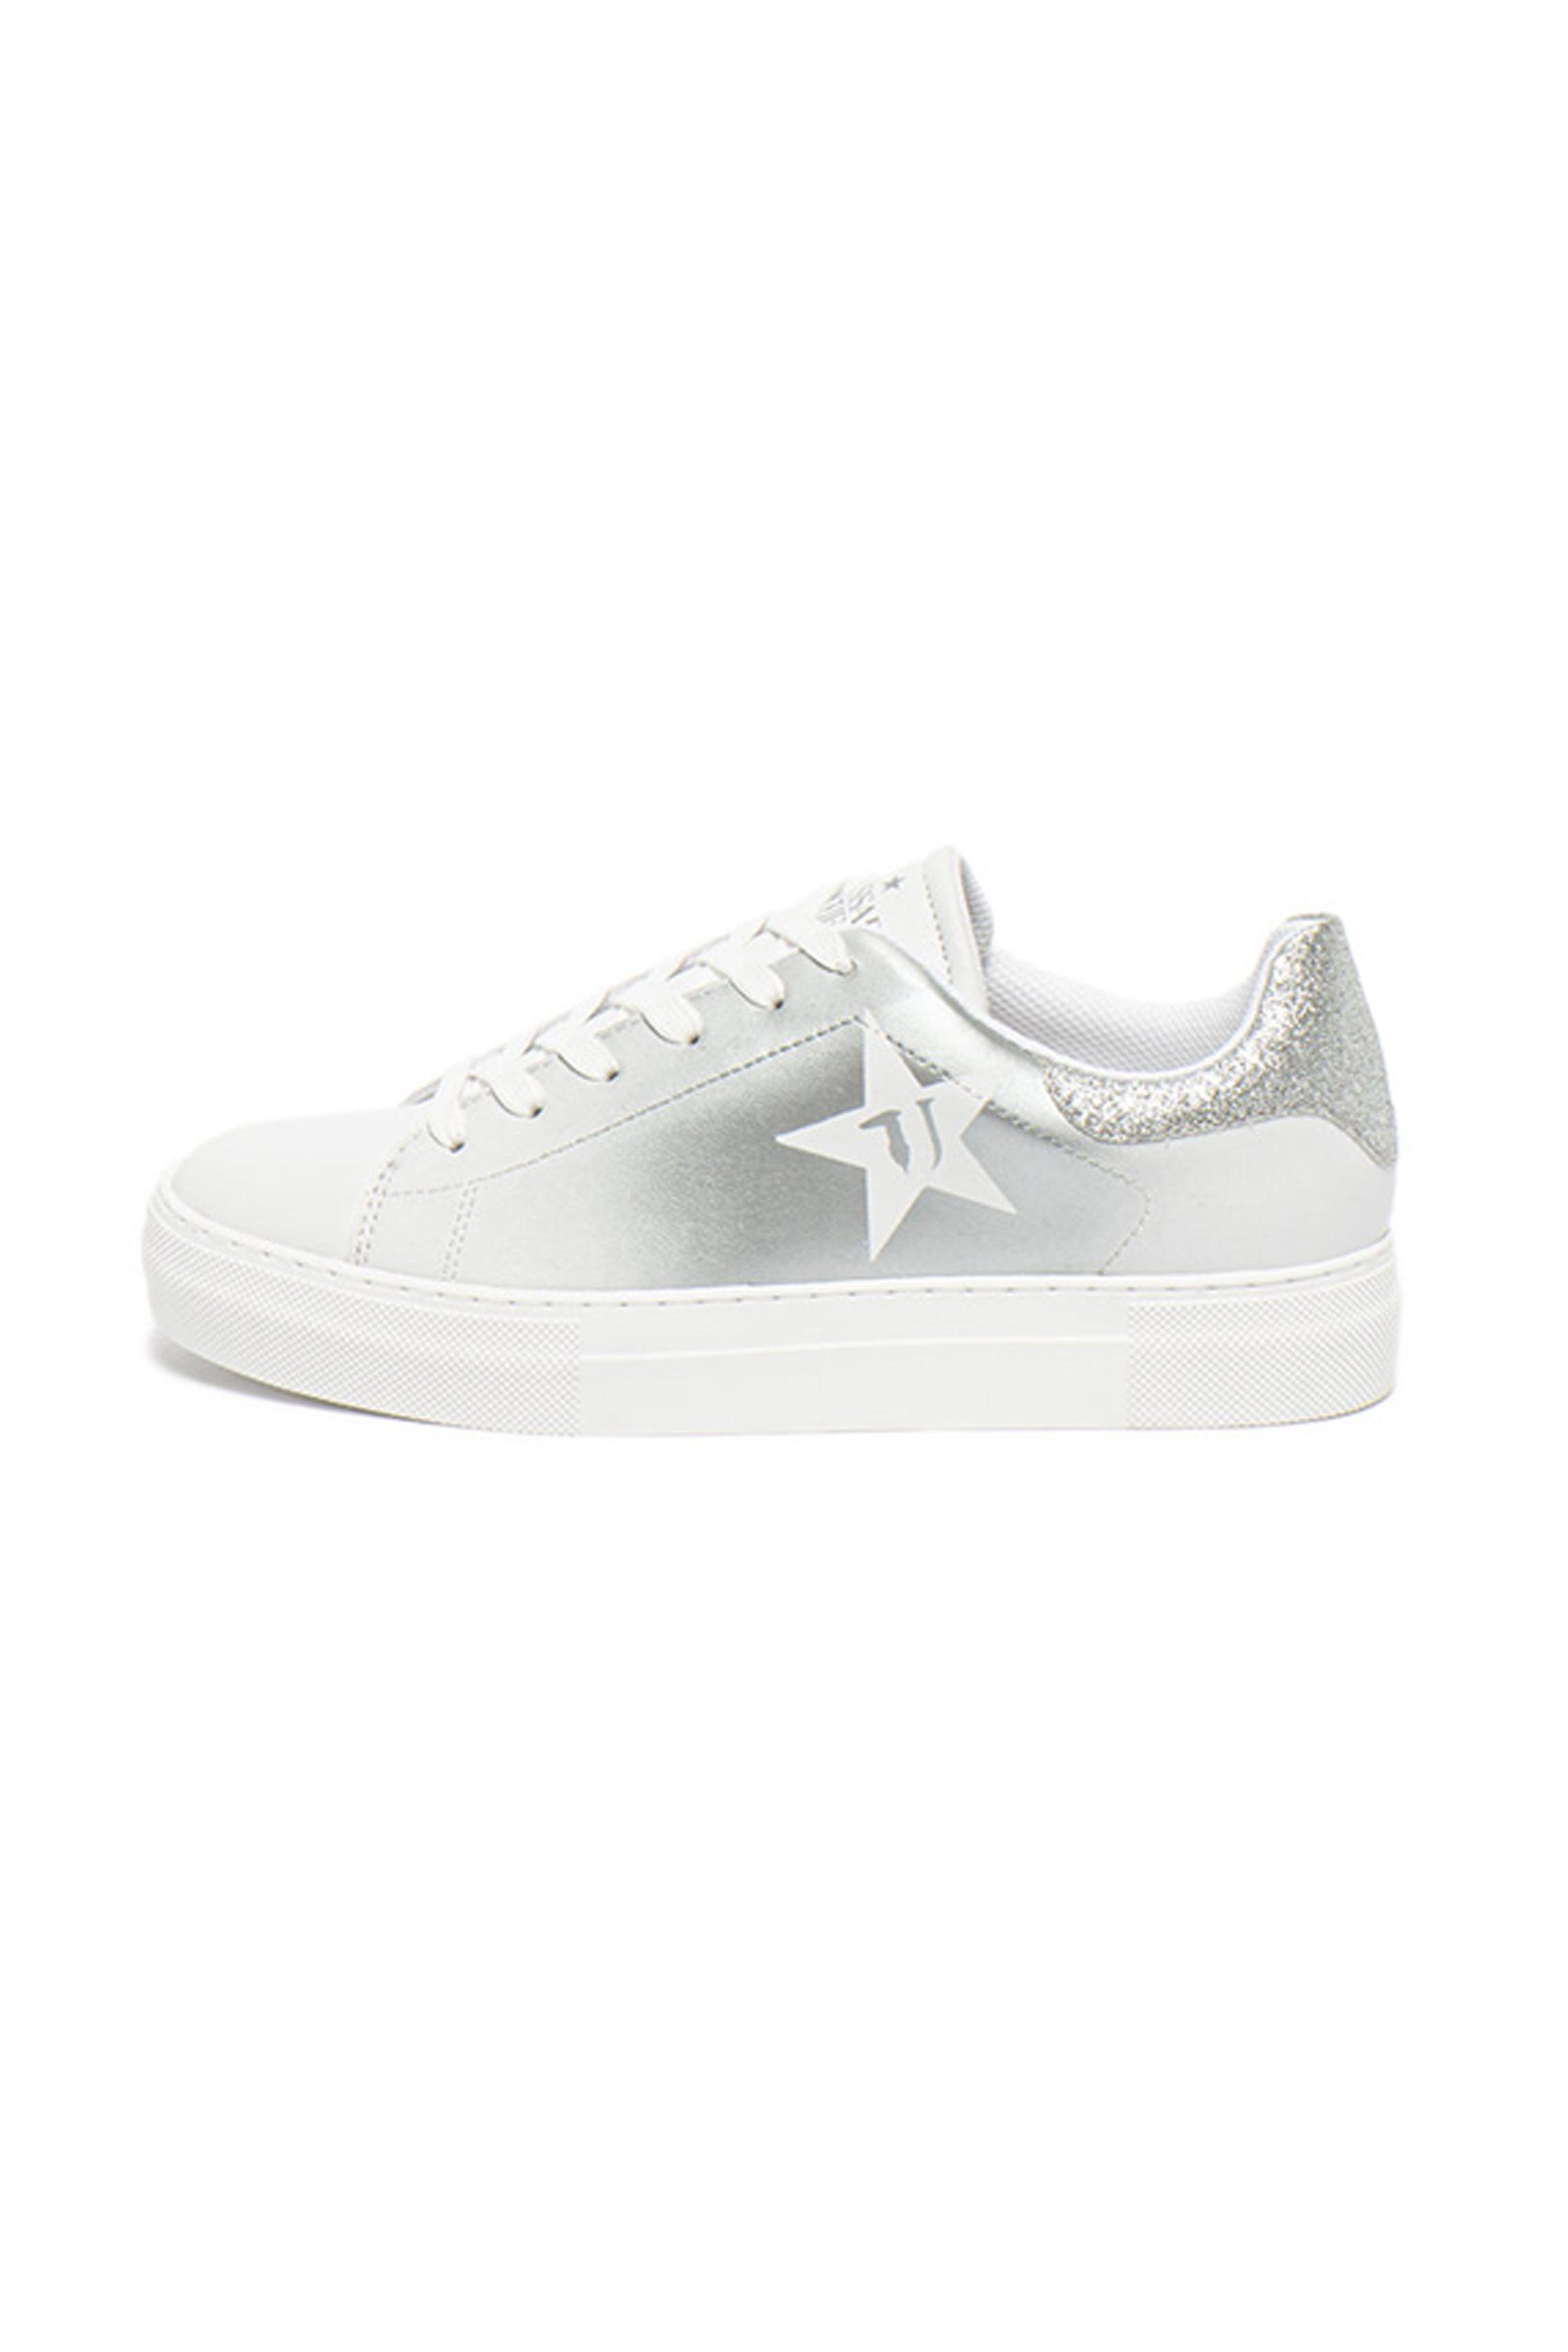 Trussardi γυναικεία sneakers με glitter – 79A00425-9Y099999 – Λευκό